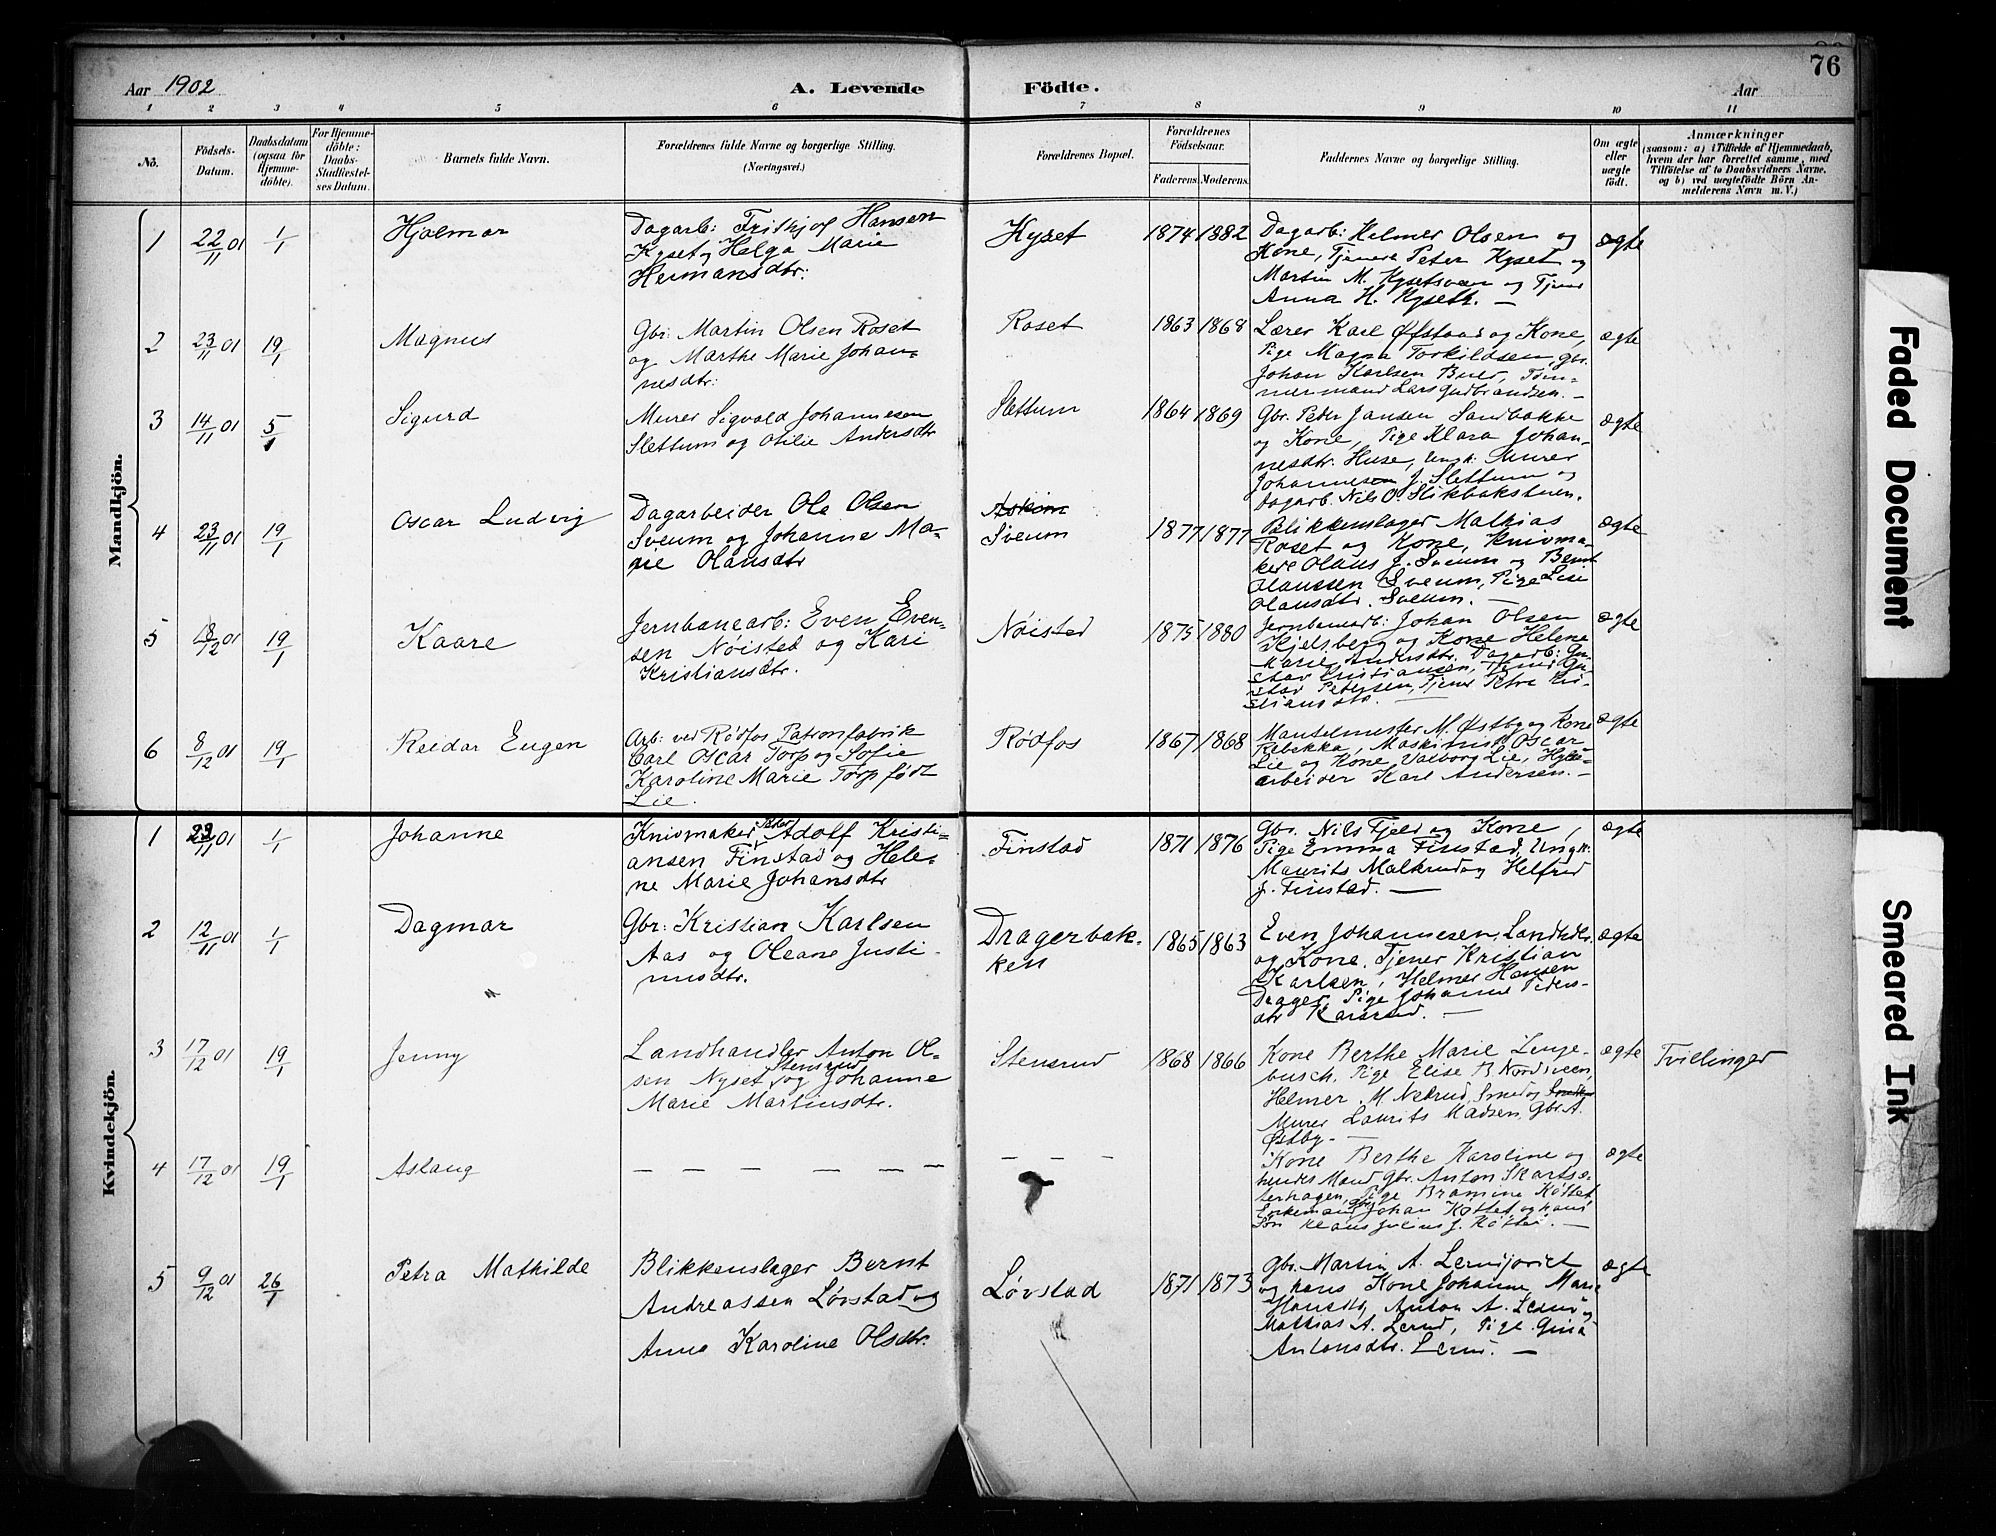 SAH, Vestre Toten prestekontor, H/Ha/Haa/L0011: Ministerialbok nr. 11, 1895-1906, s. 76